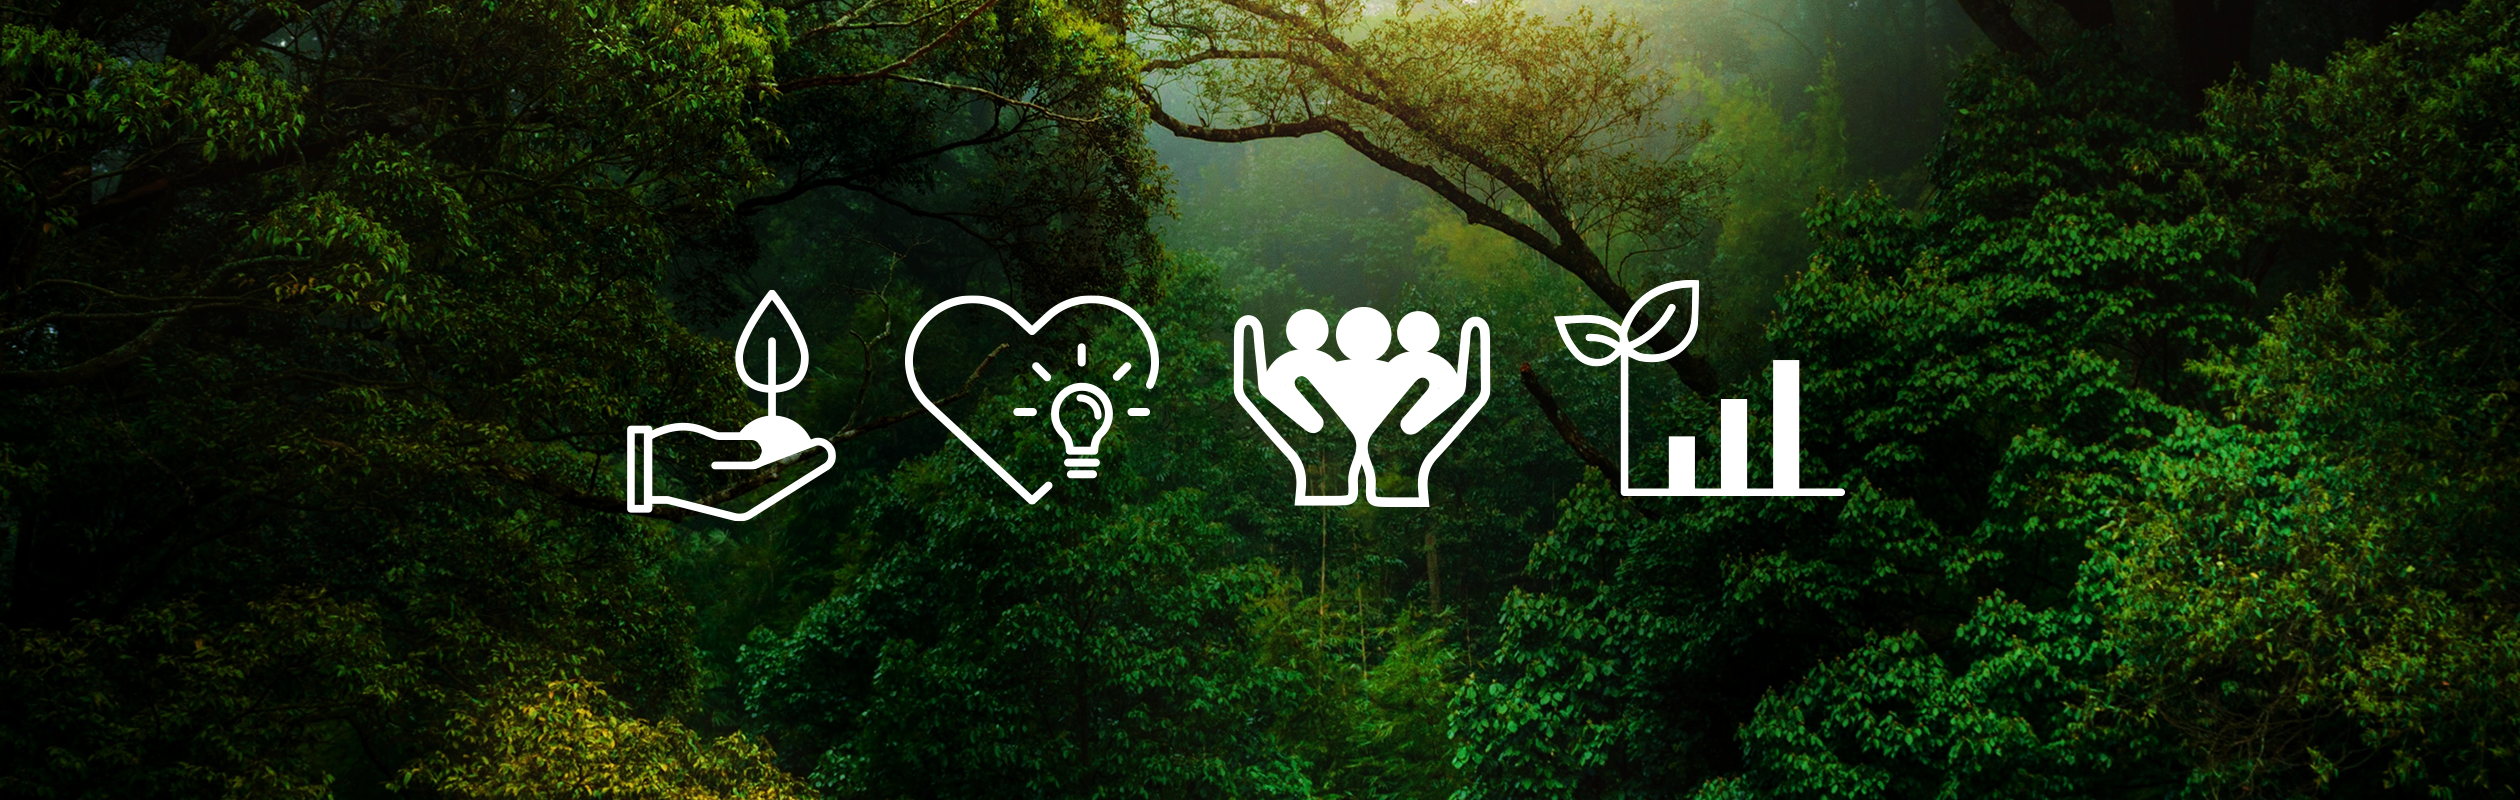 Wald mit Icons